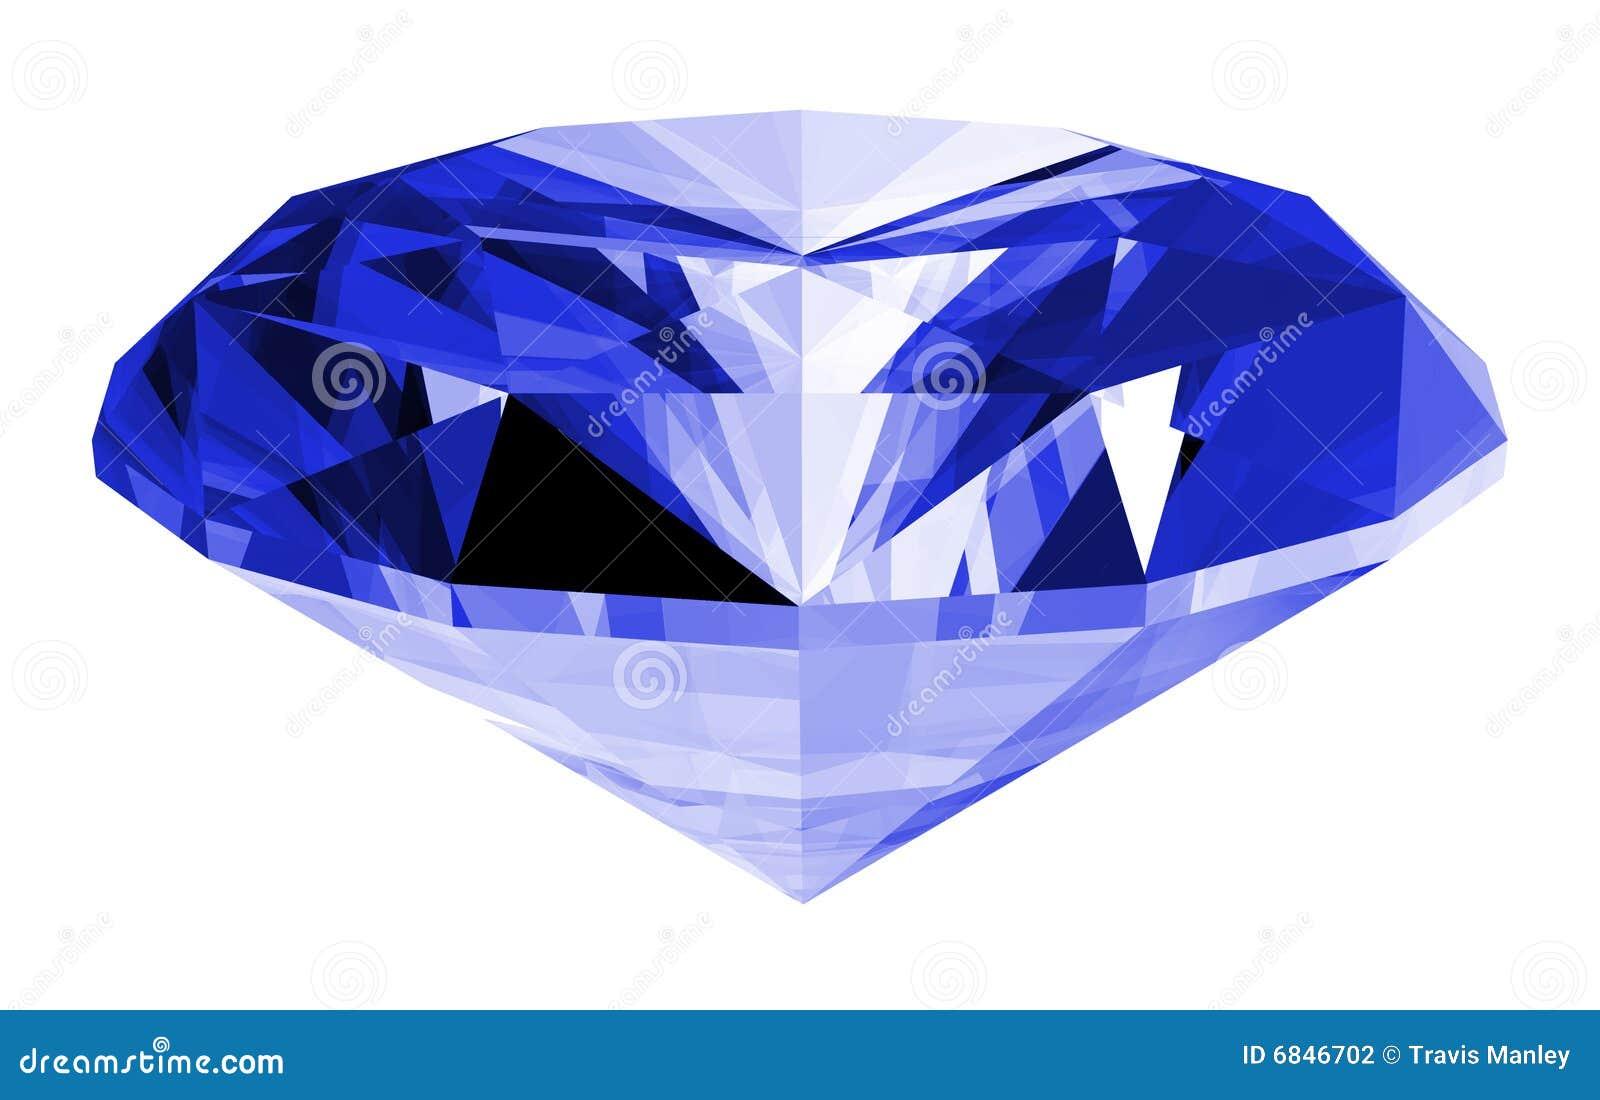 3d宝石查出的青玉